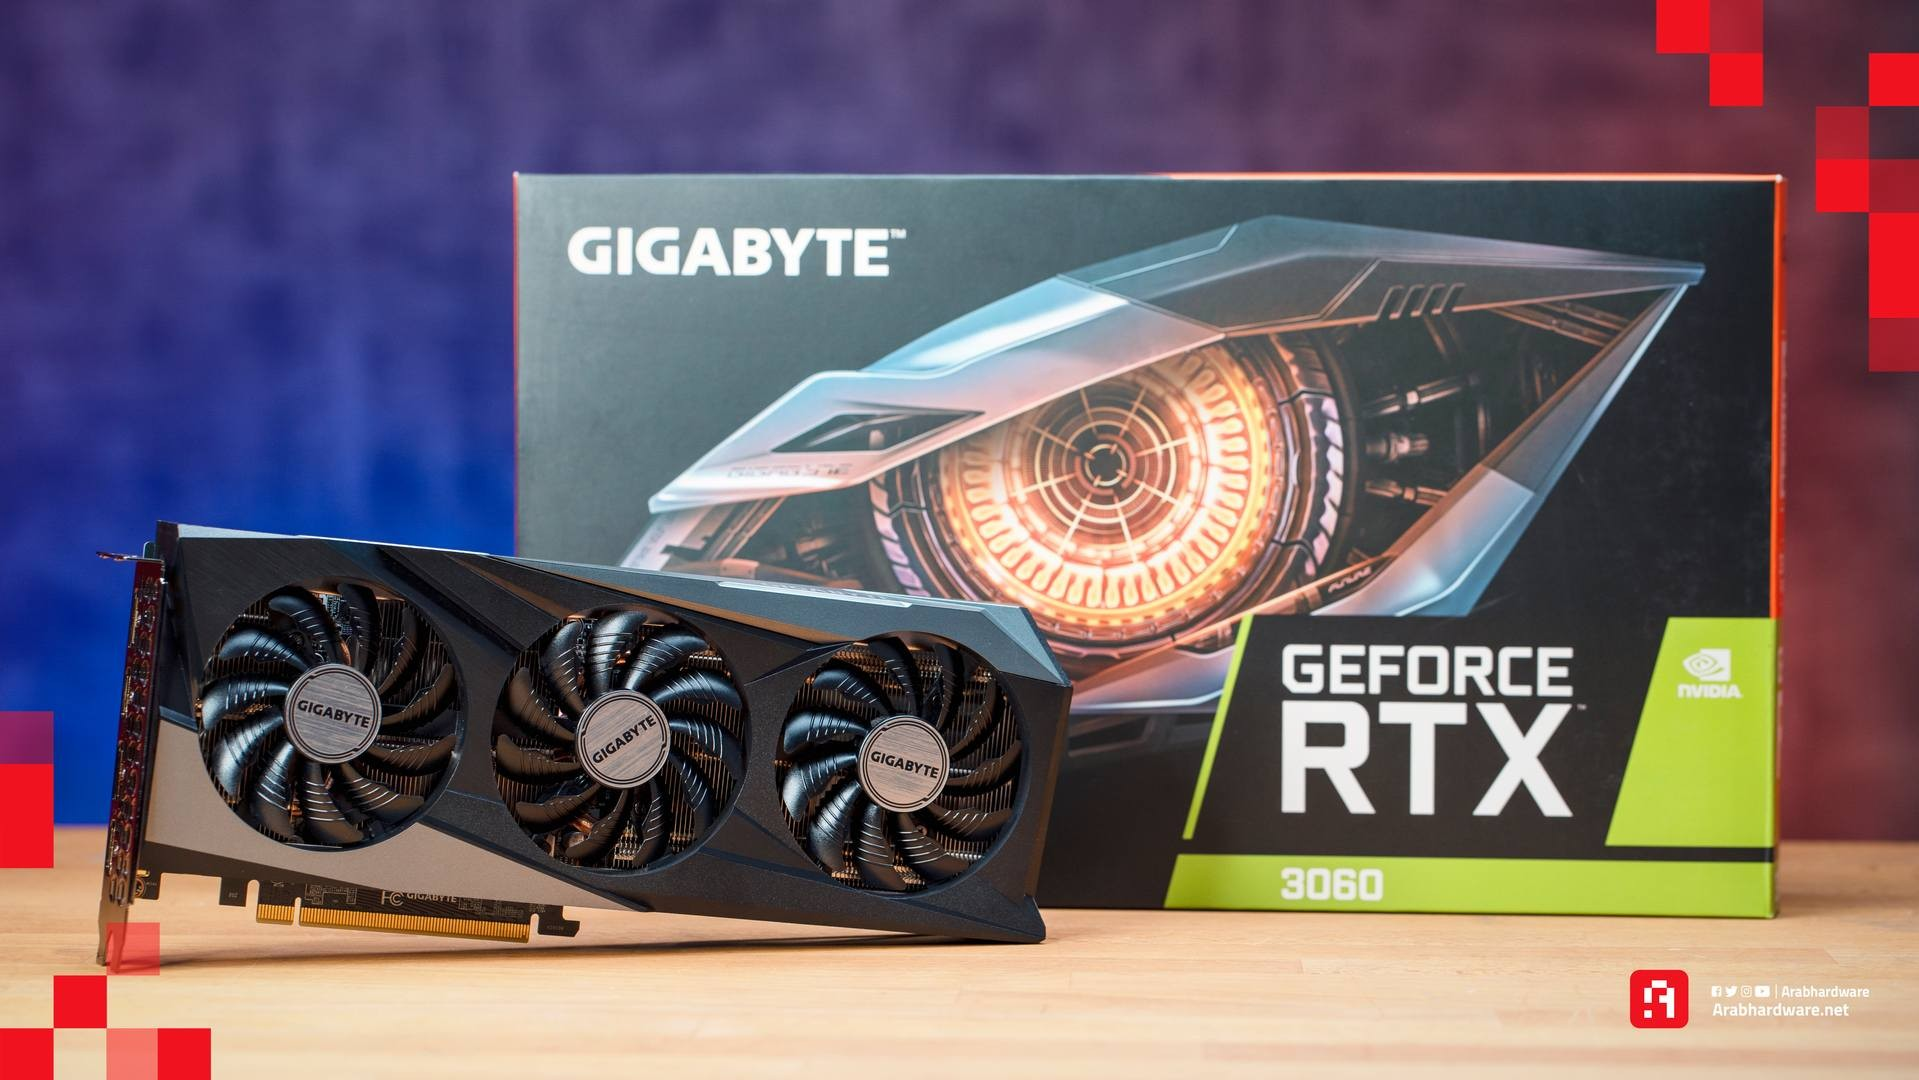 Gigabyte RTX 3060 Gaming OC NVIDIA